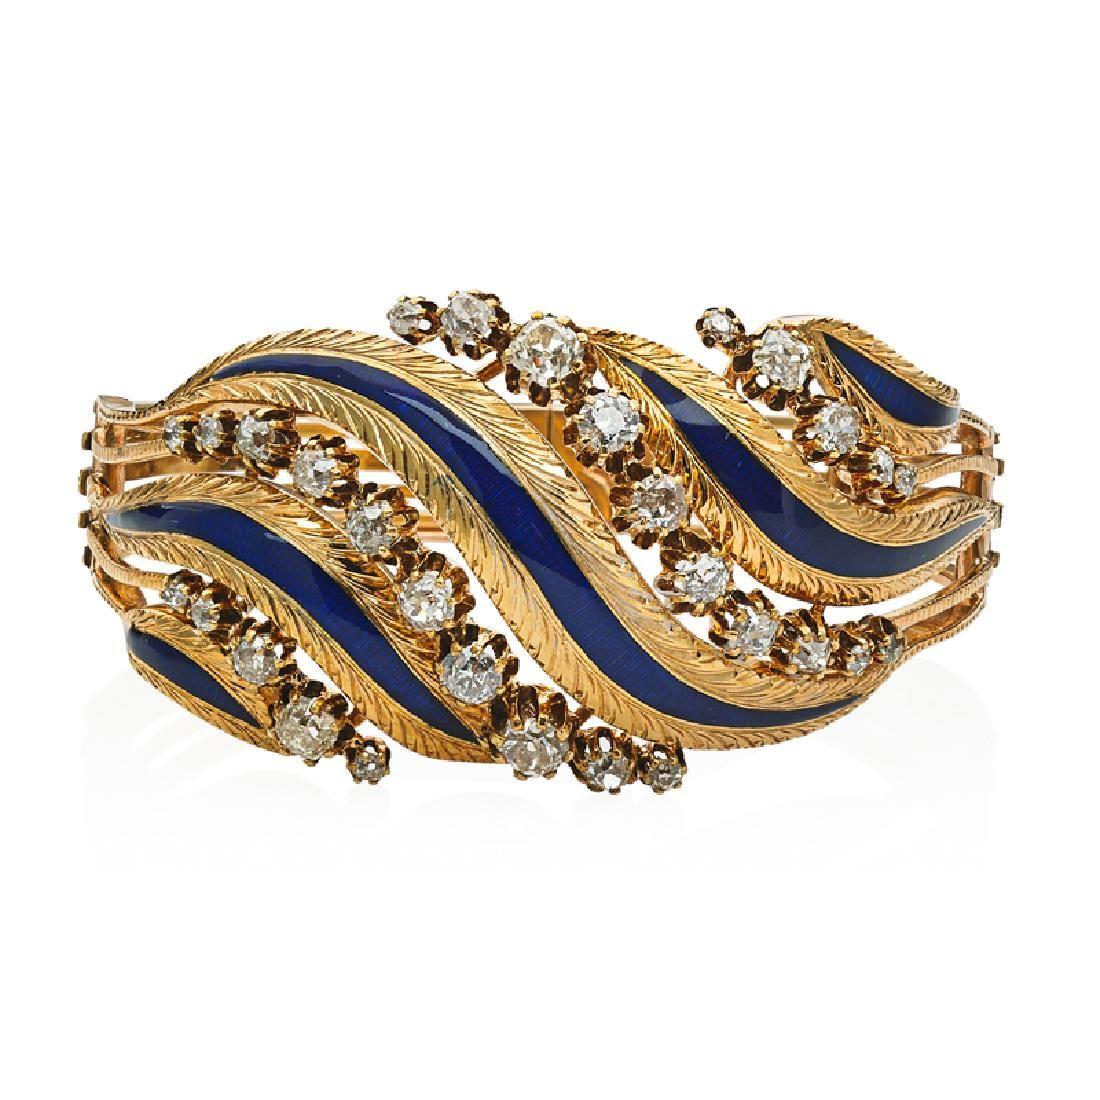 FRENCH DIAMOND & ENAMELED YELLOW GOLD CUFF BRACELET